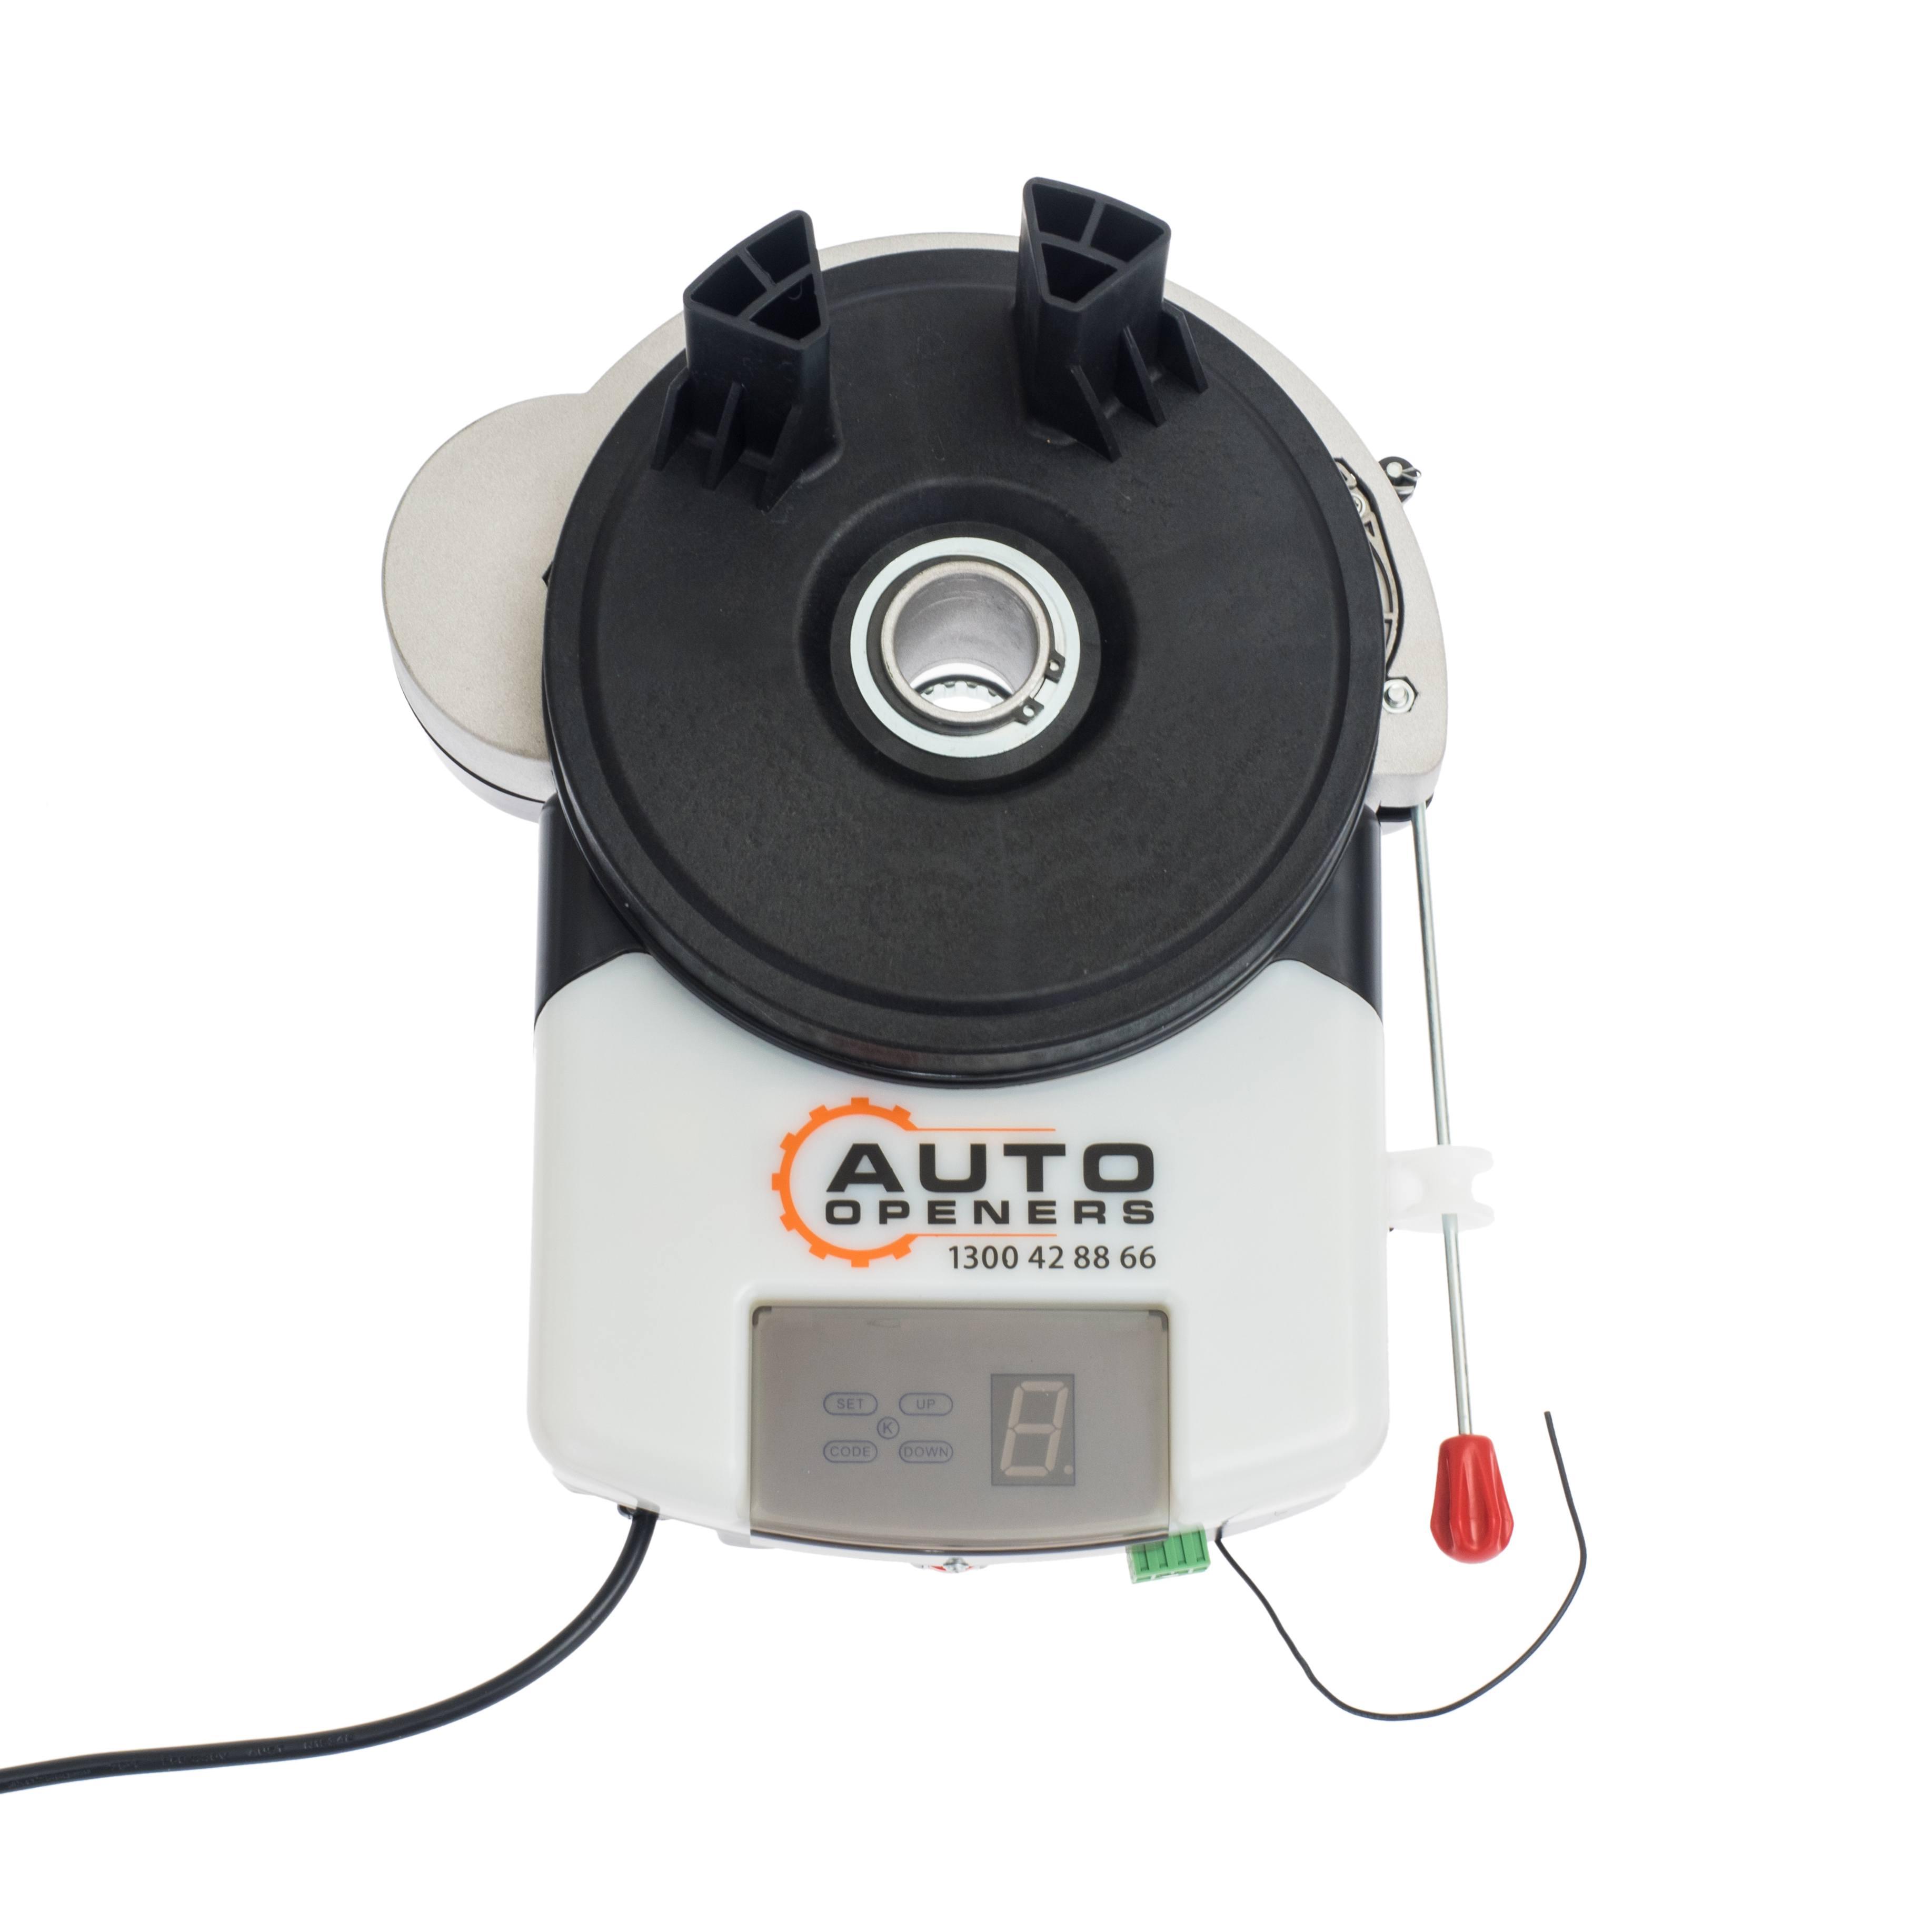 superb capacitor door liftmaster opener garage handballtunisie org lowes l master remotes access